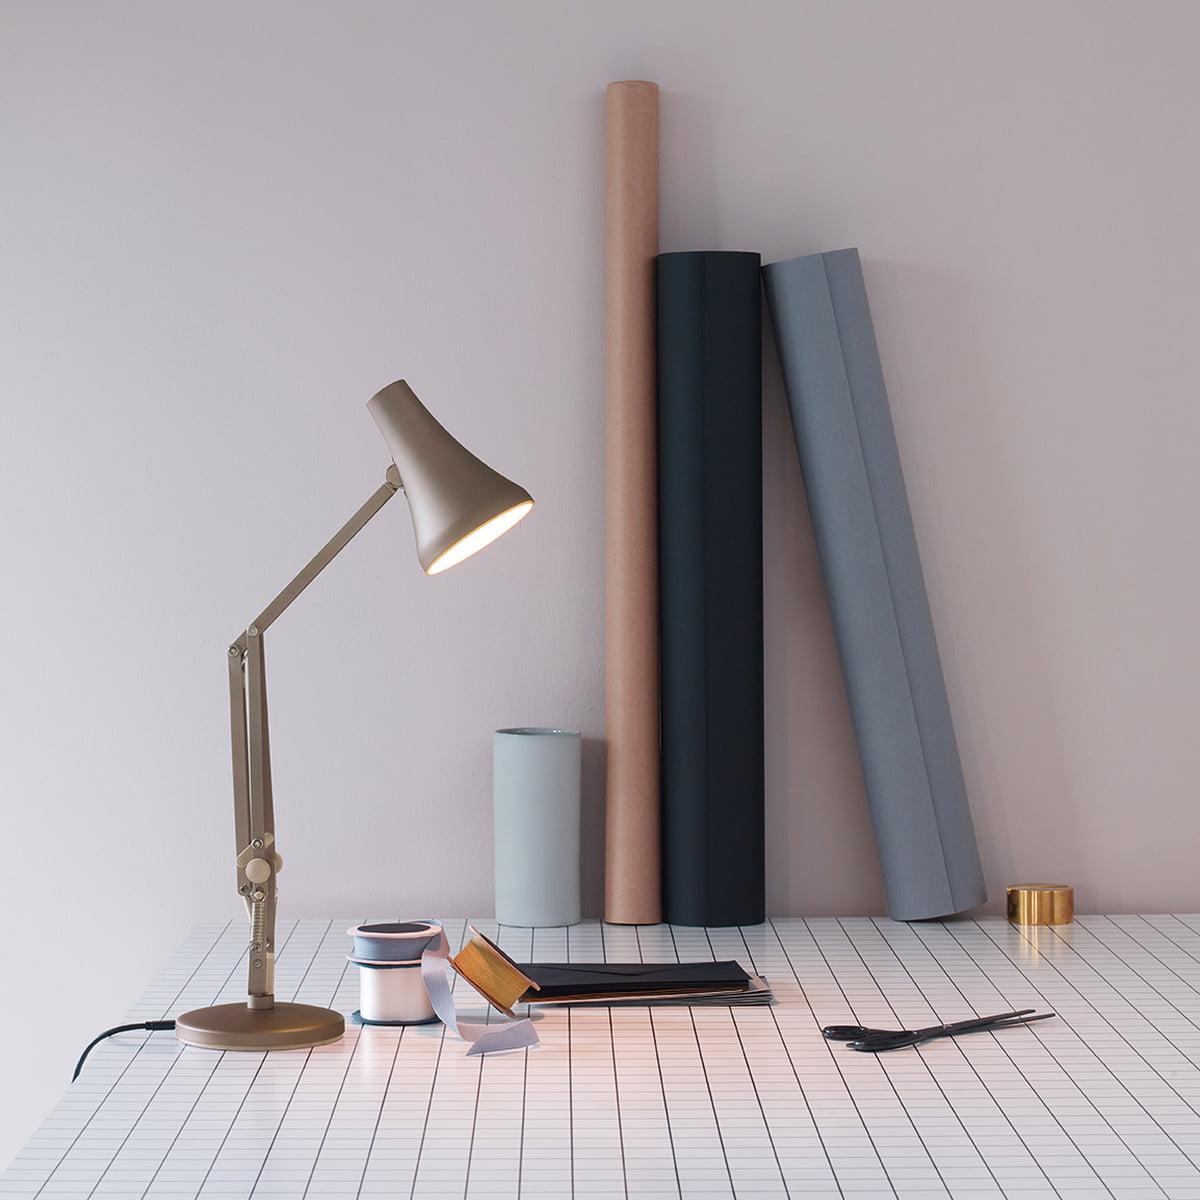 Anglepoise 90 De Mini Table Chaud Blush LedArgent Luminaire oQrCdWxBe